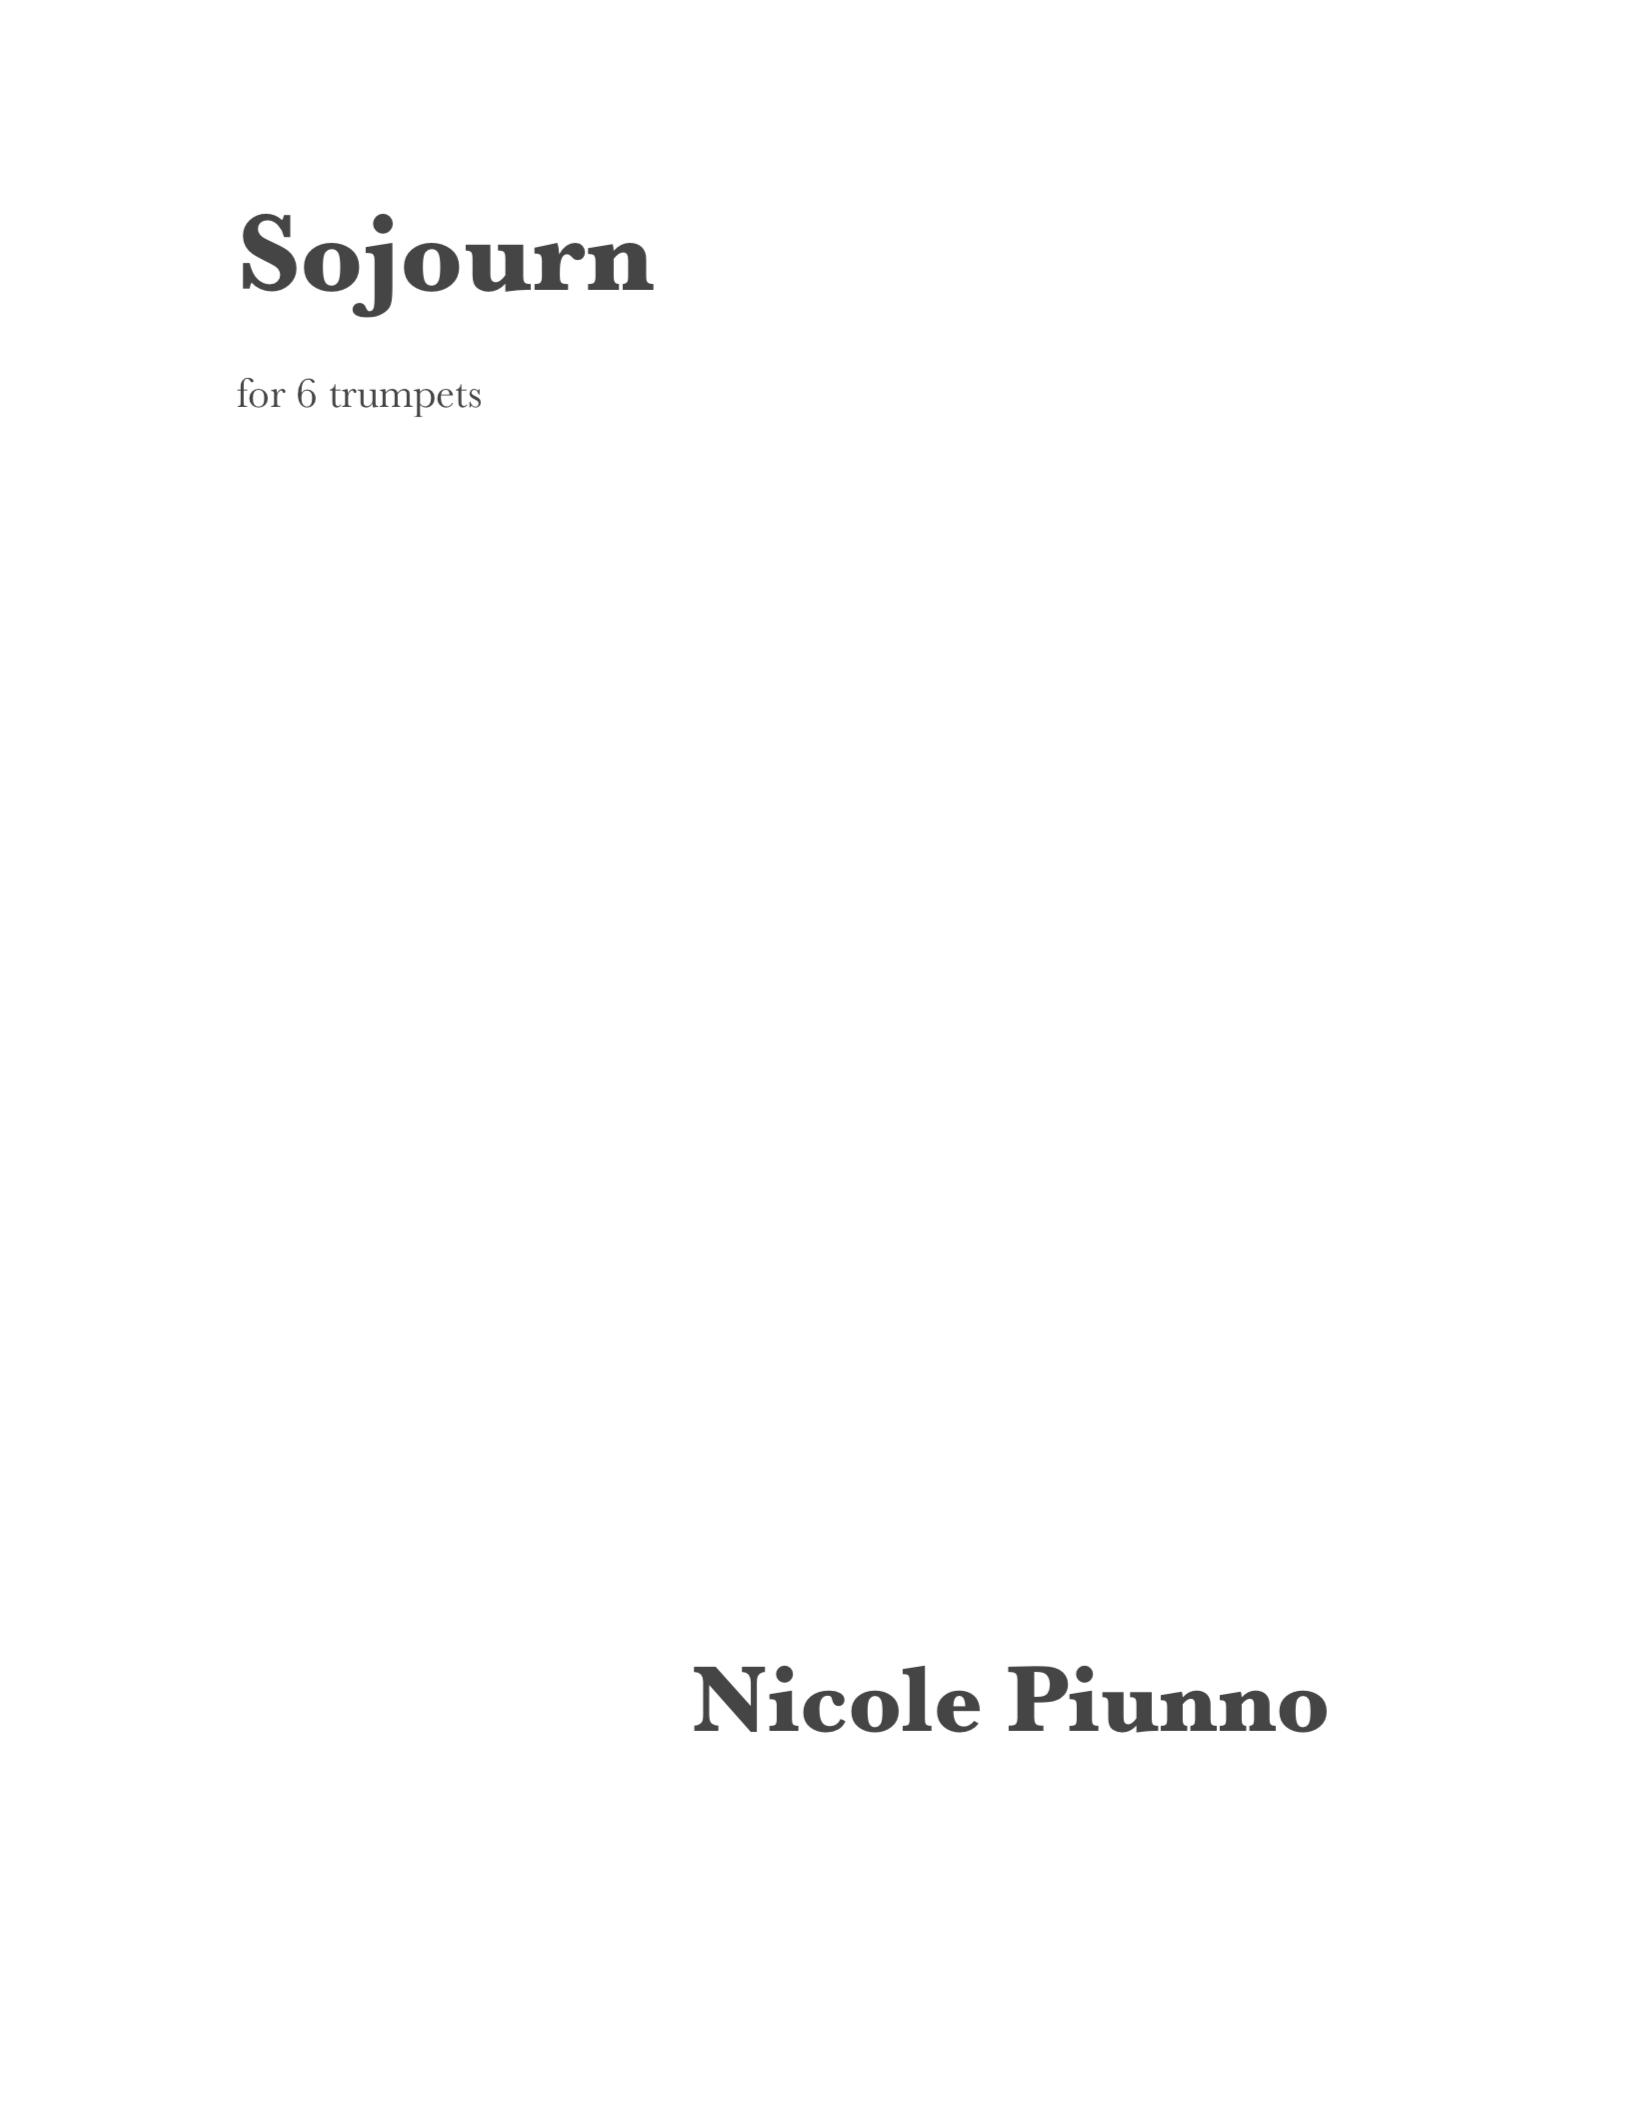 Sojourn  by Nicole Piunno